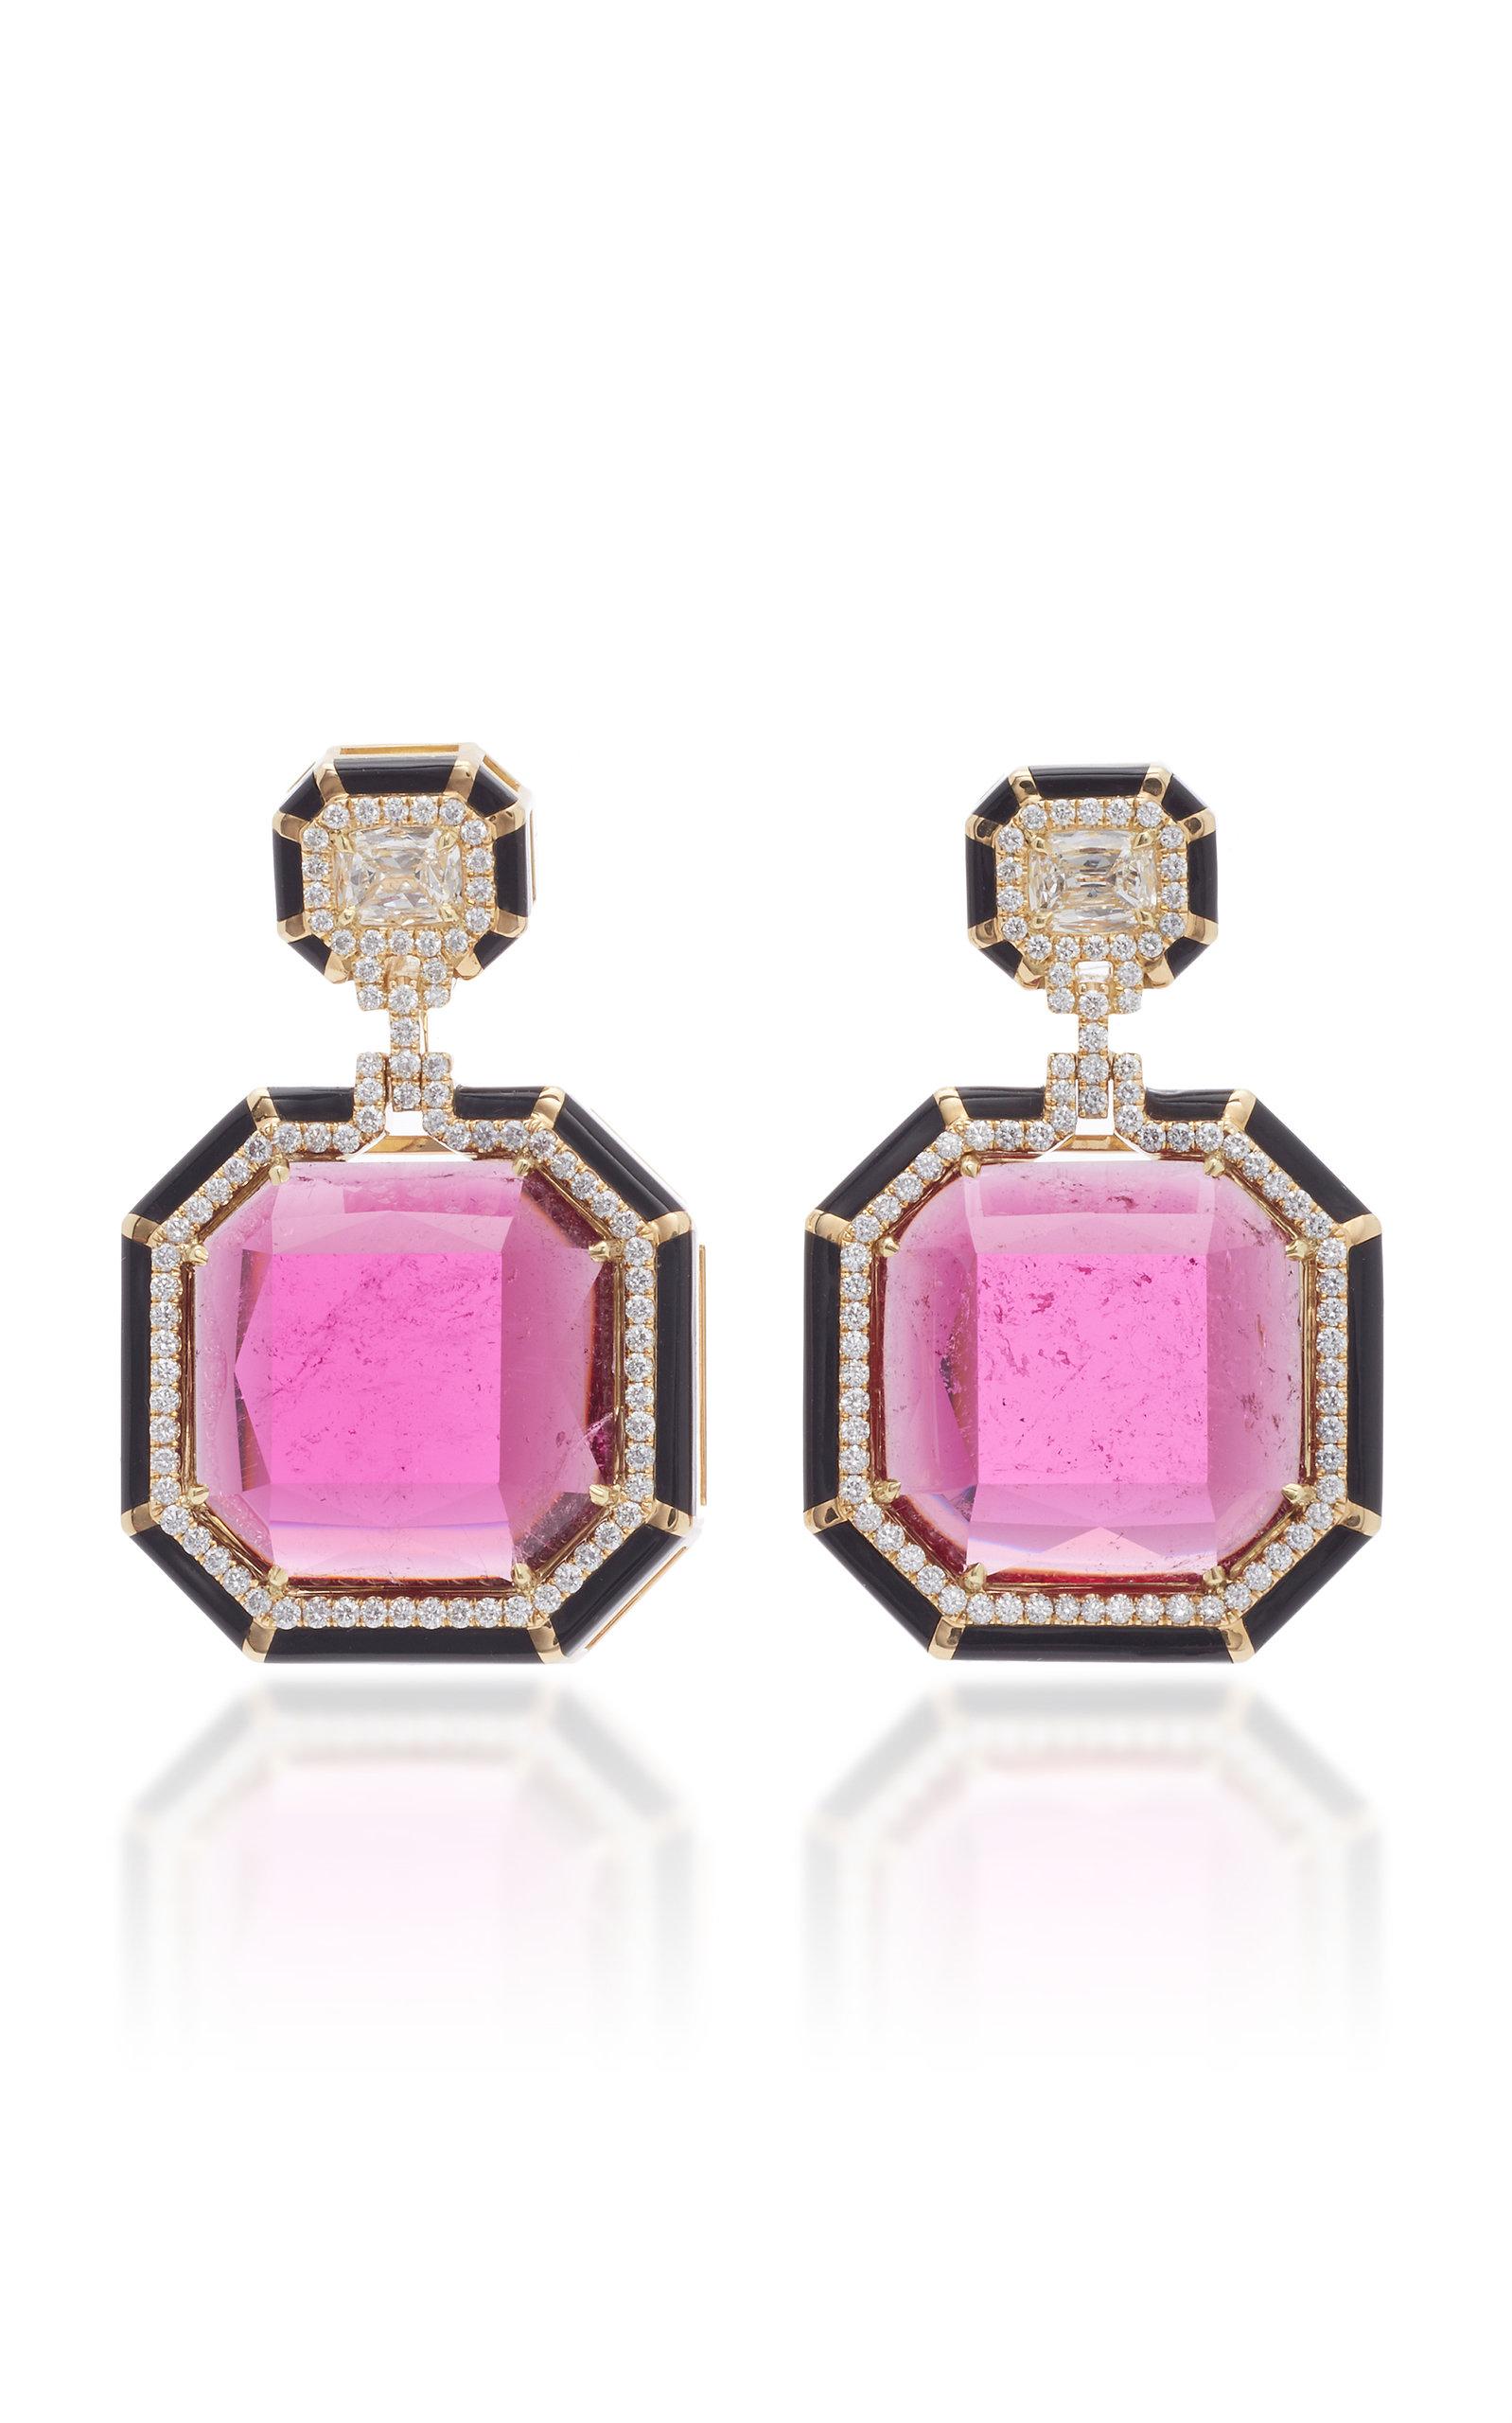 GOSHWARA 18K Gold Rubellite And Diamond Earrings in Pink